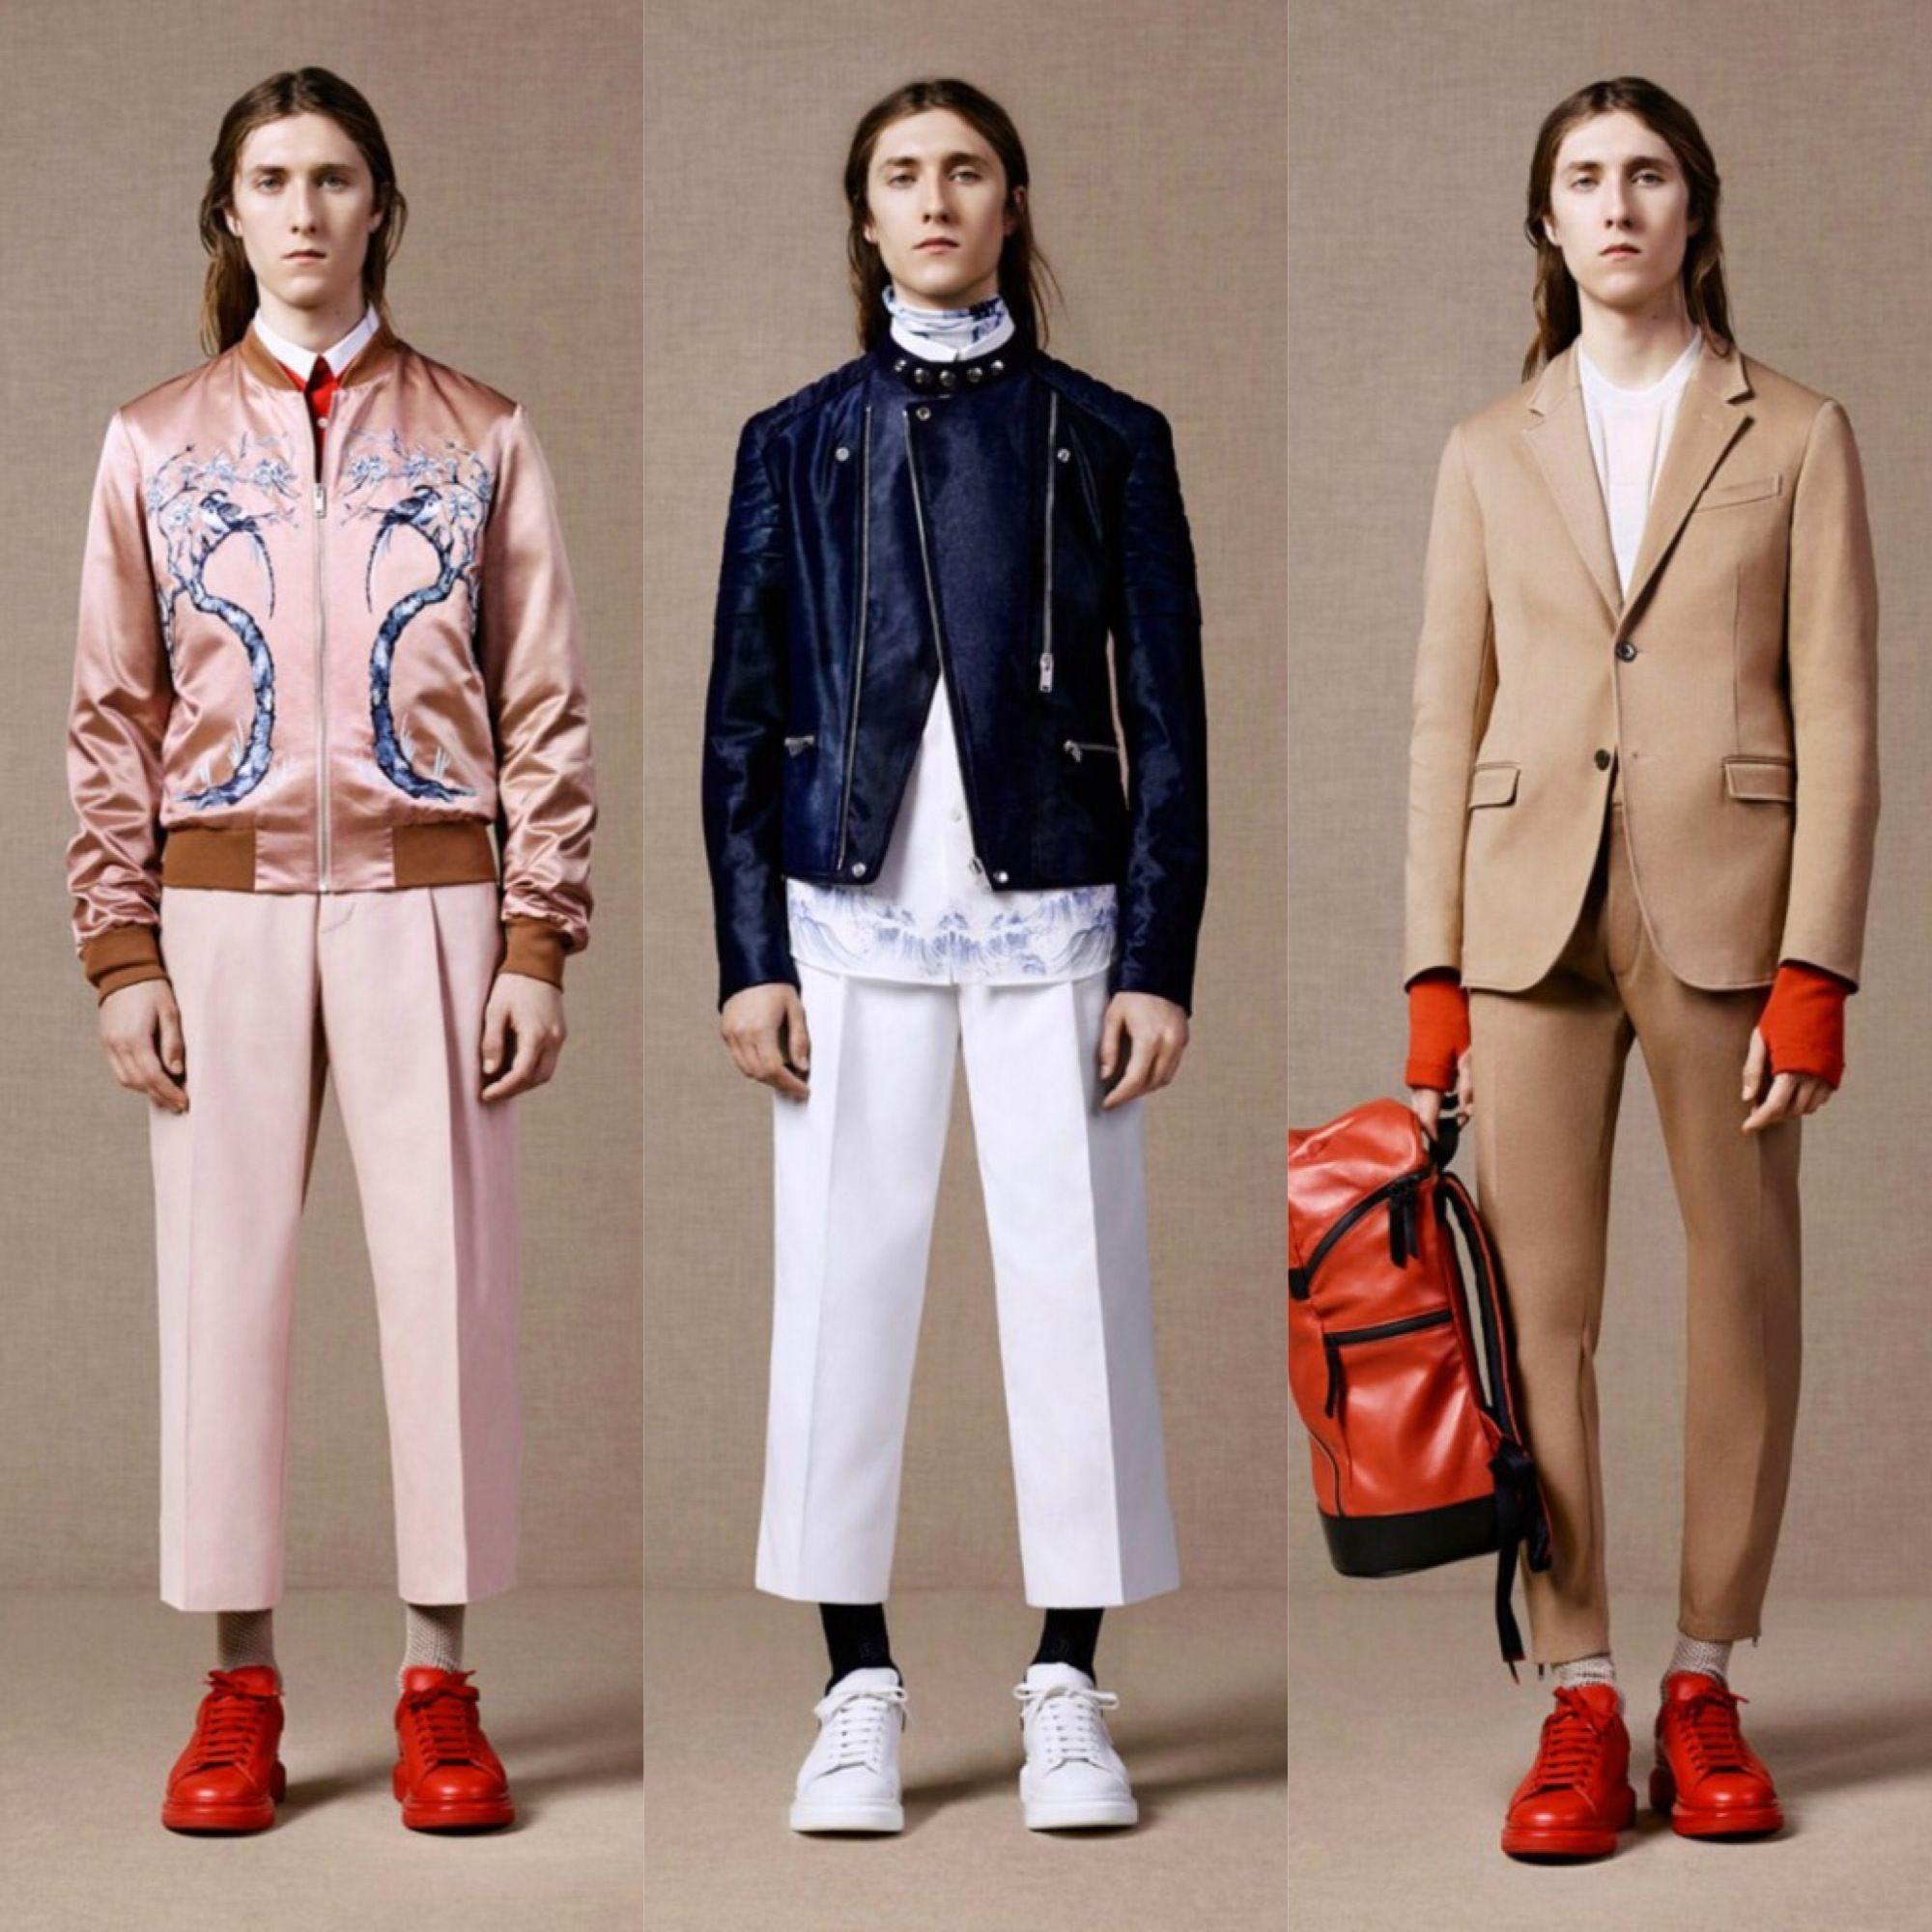 Alexander McQueen Pre-Spring/Summer 2016 Lookbook